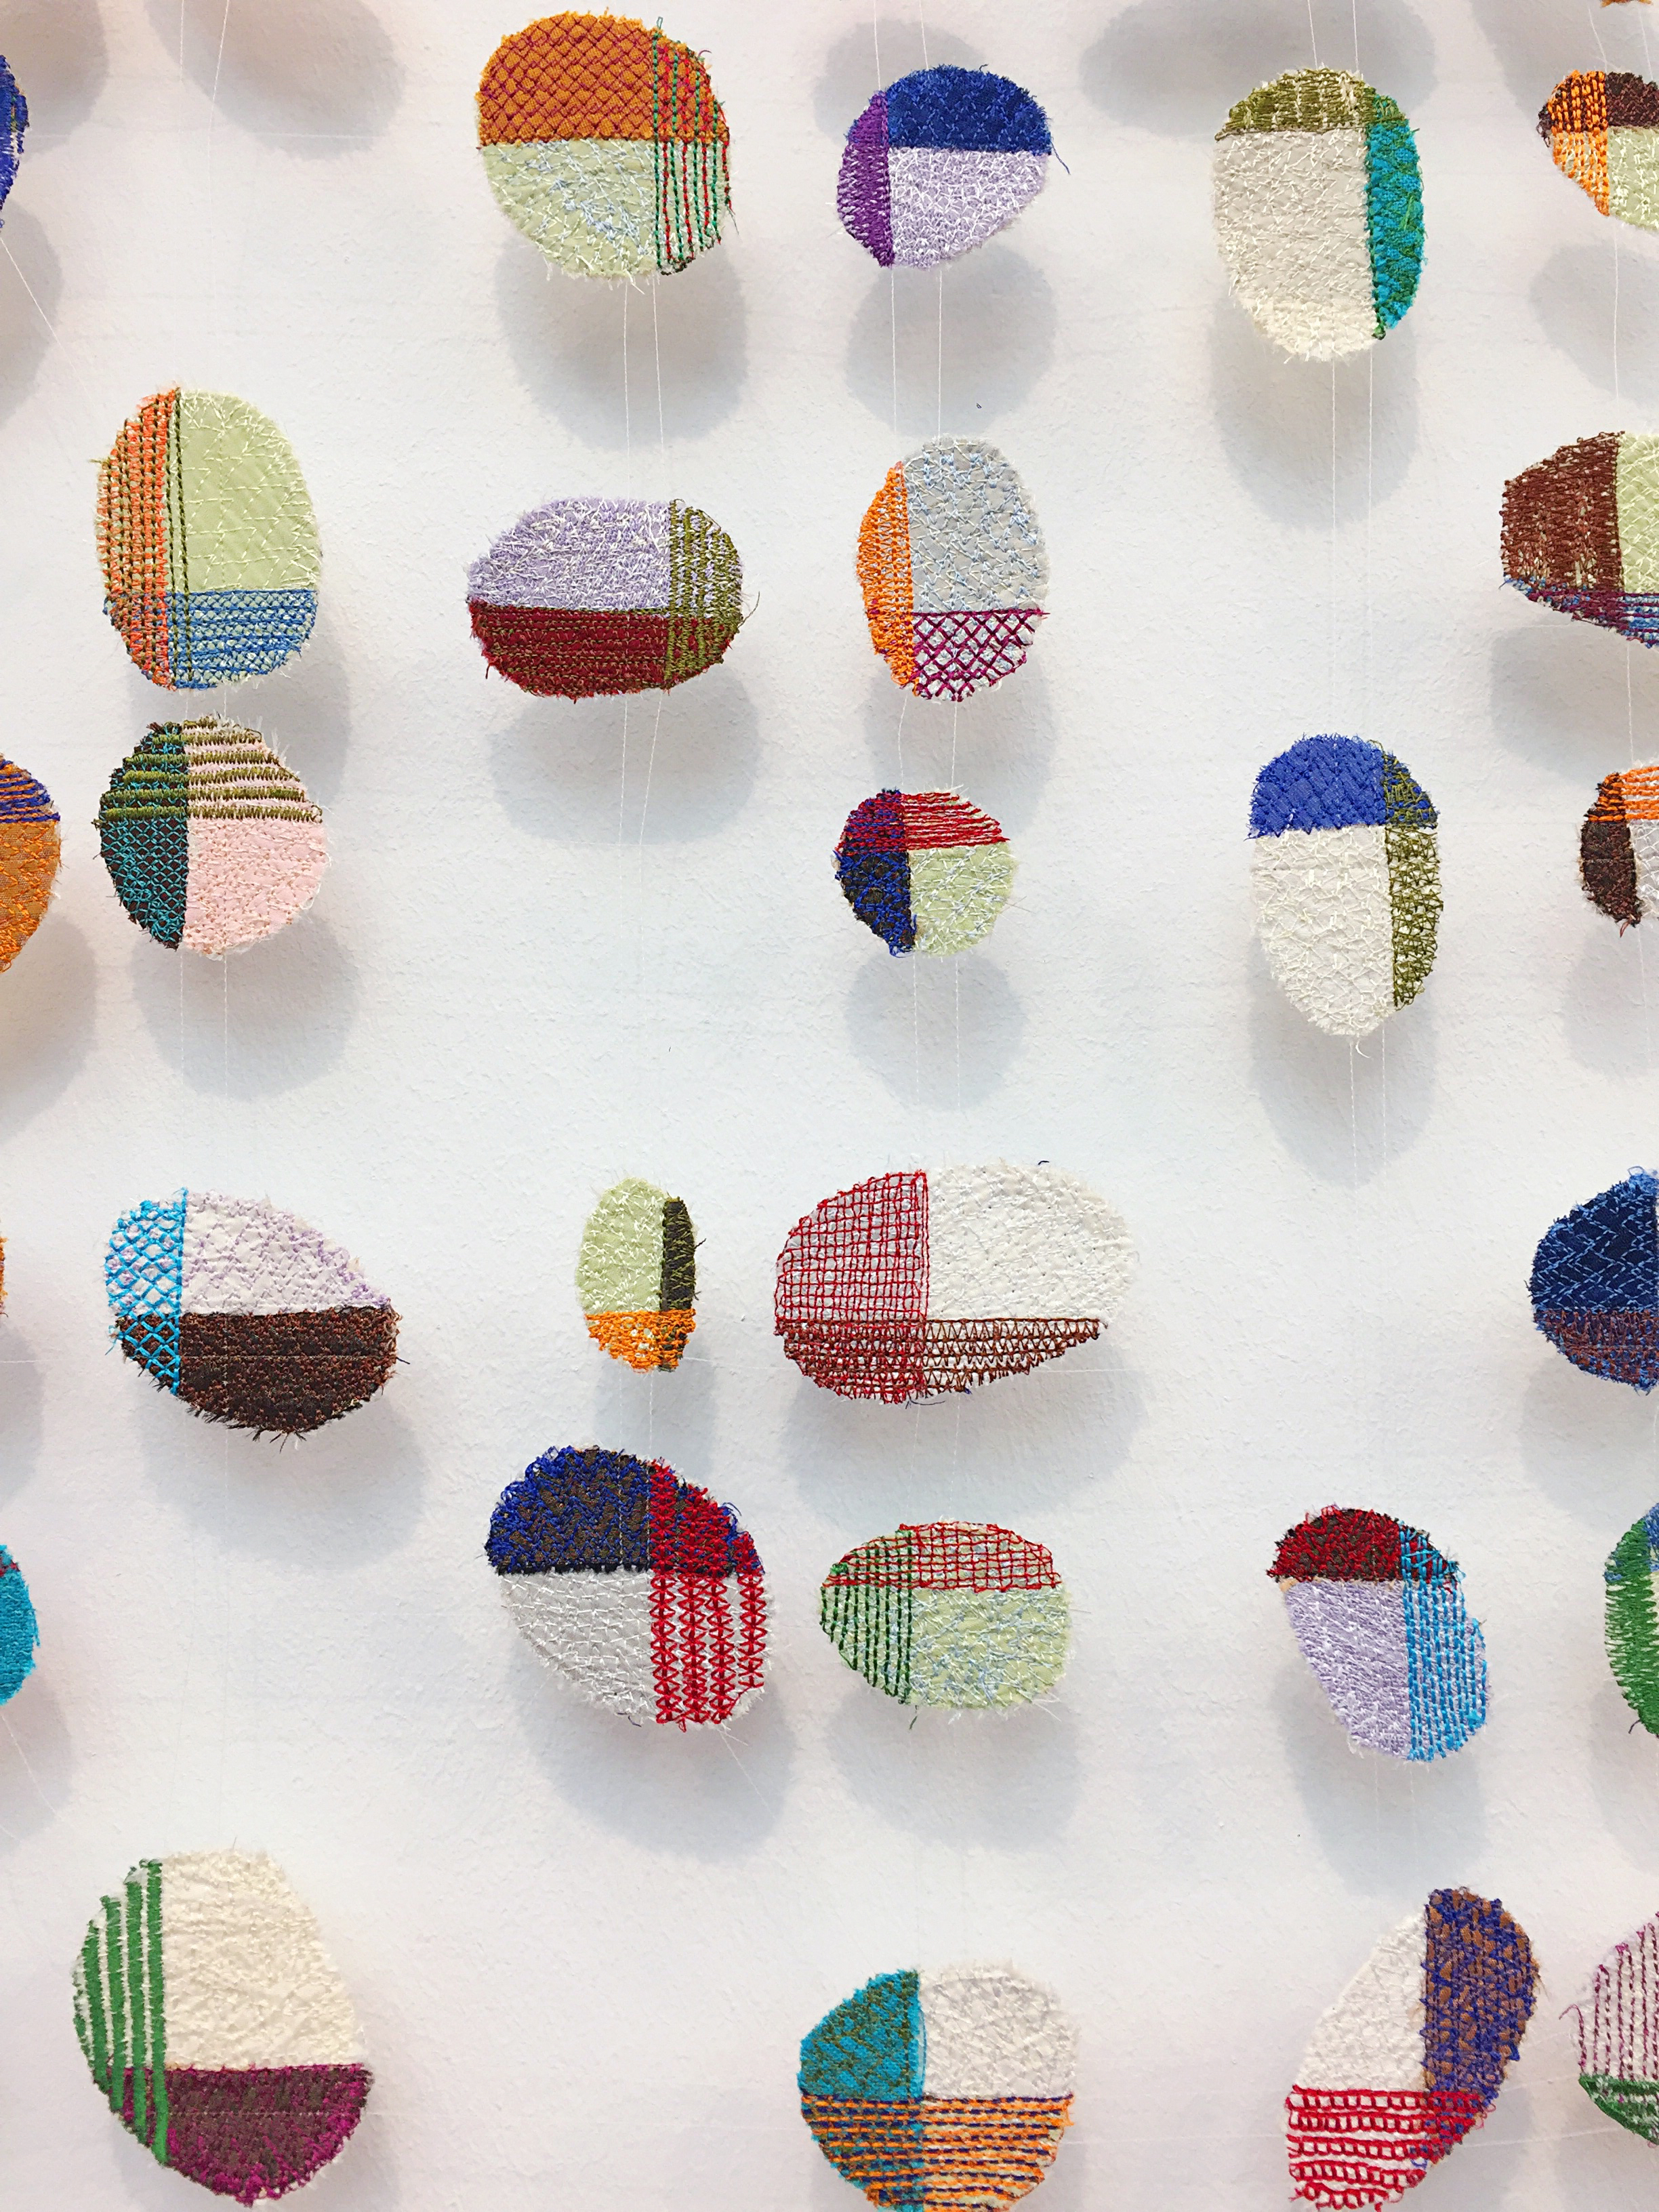 Marian Bijlenga at Flow Gallery